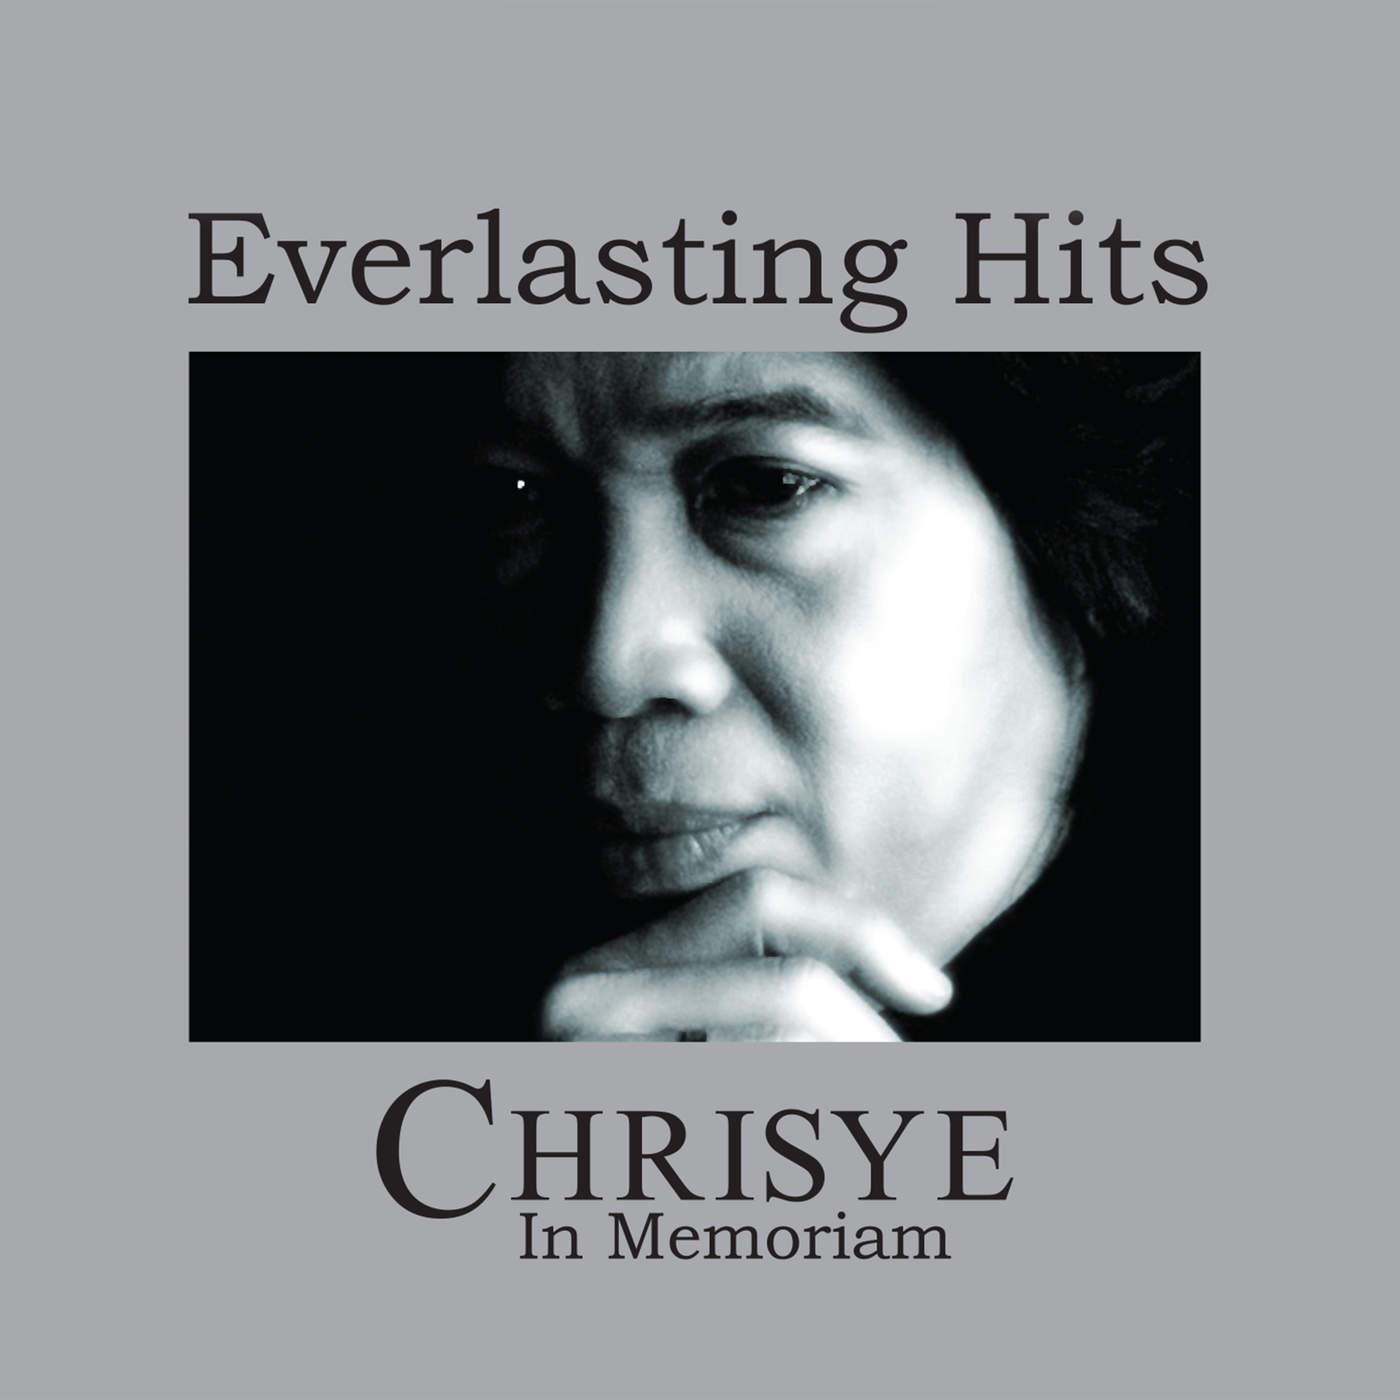 Chrisye - Everlasting Hits - Album (2007) [iTunes Plus AAC M4A]